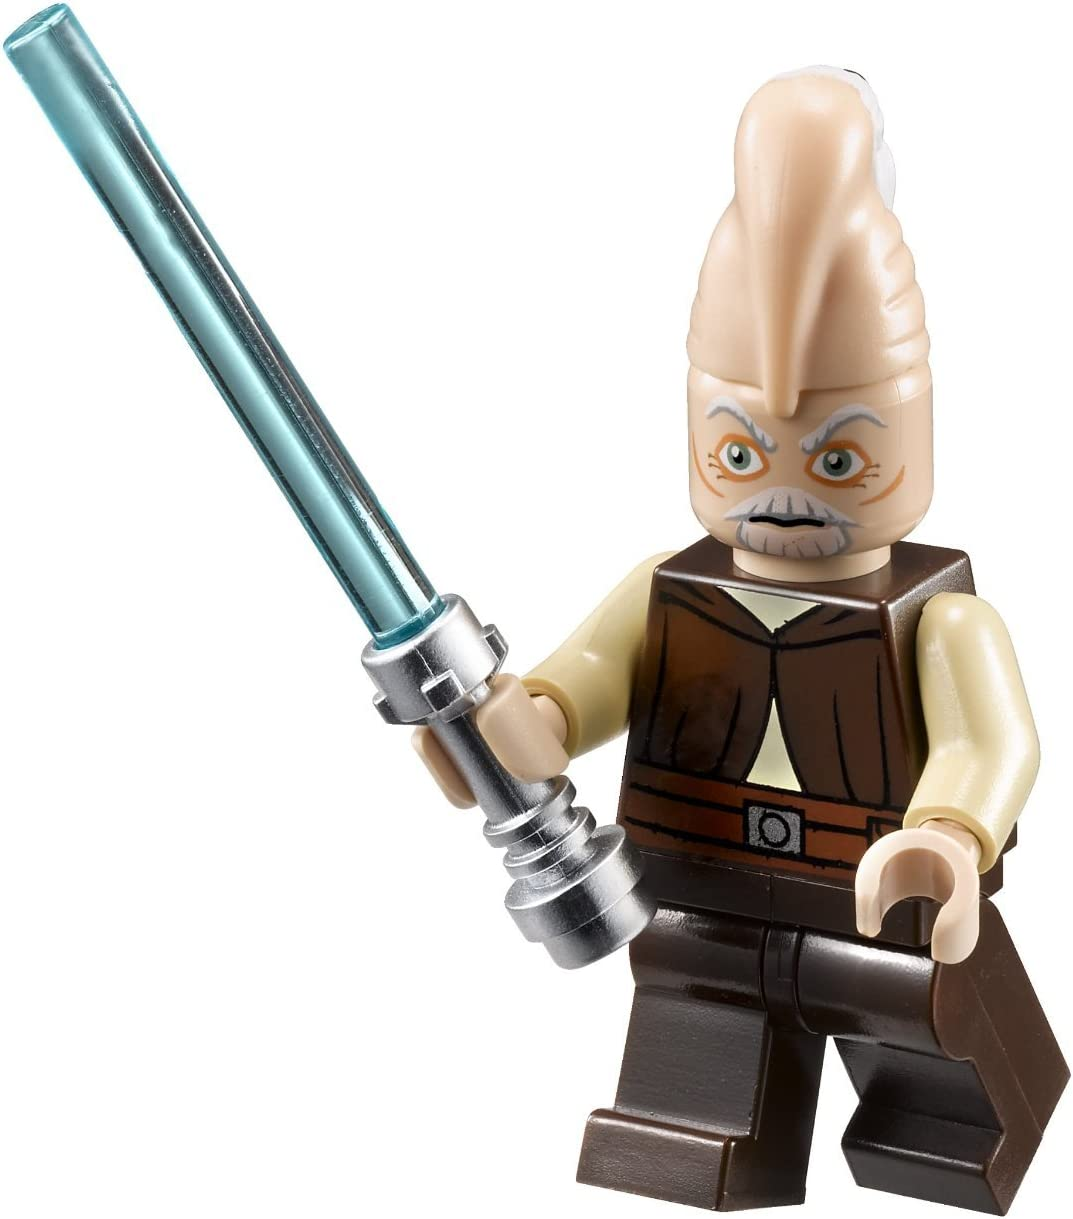 Ki-Adi Mundi ~ Lego Star Wars Minifigure with Lt. Blue Lightsaber